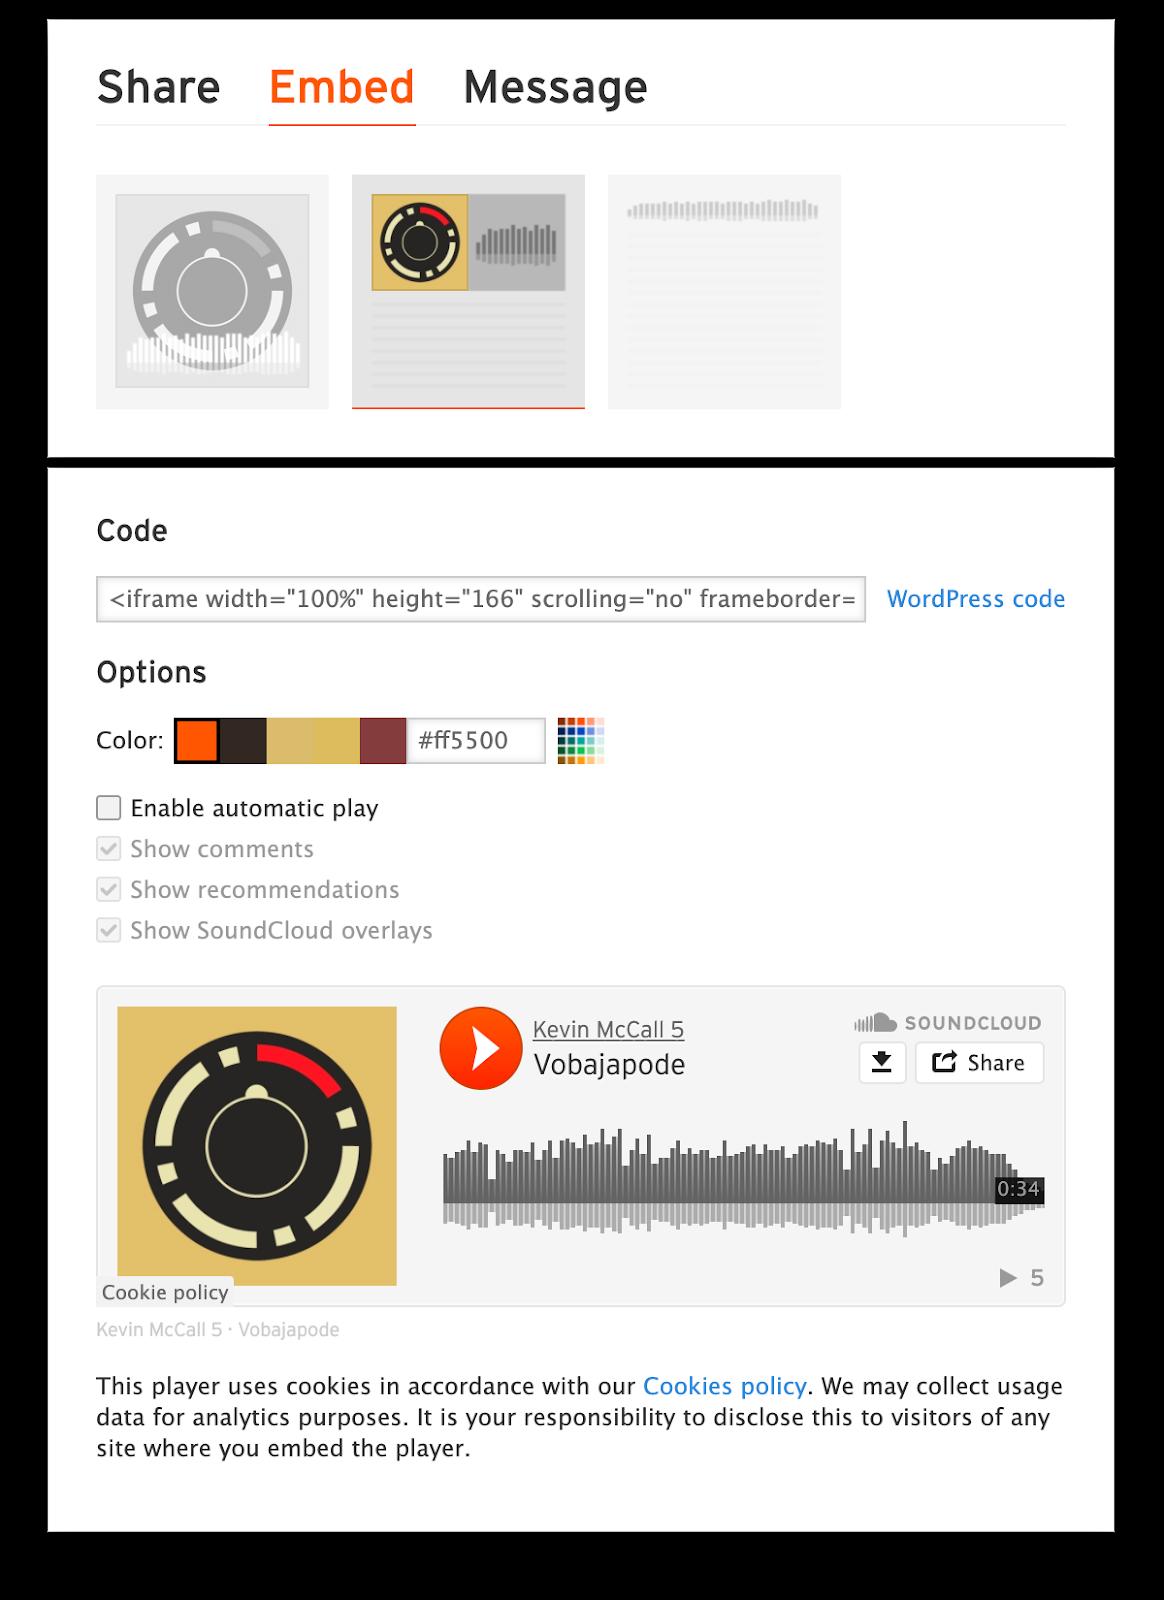 Soundcloud embed settings